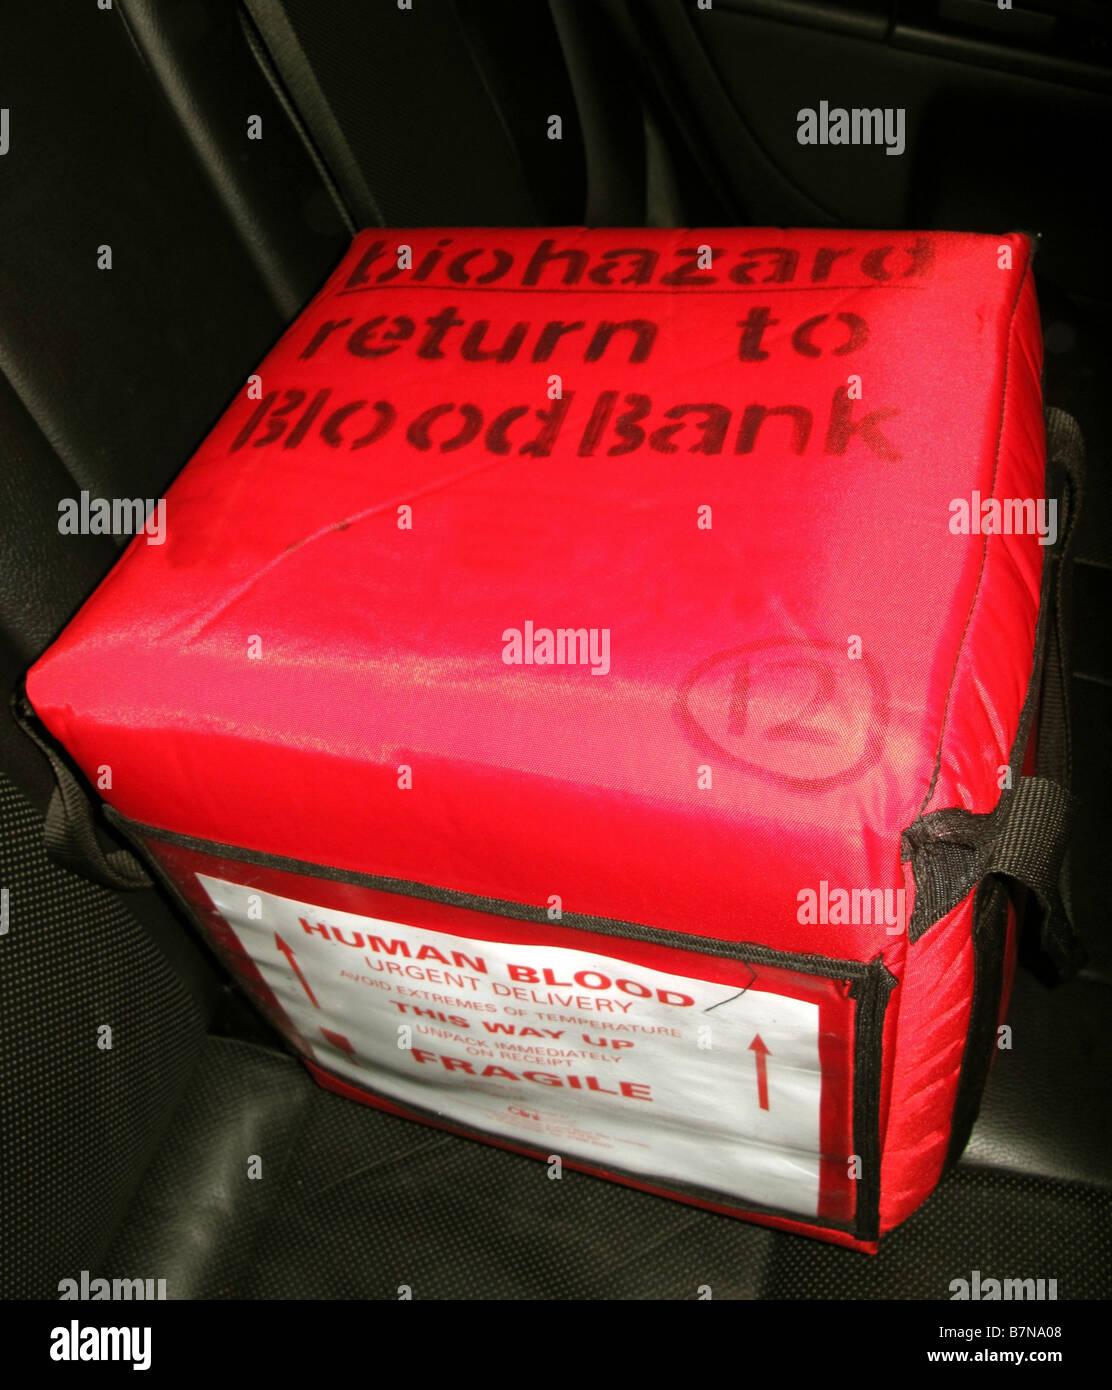 Human Blood Transportation box South Wales GB UK 2009 - Stock Image